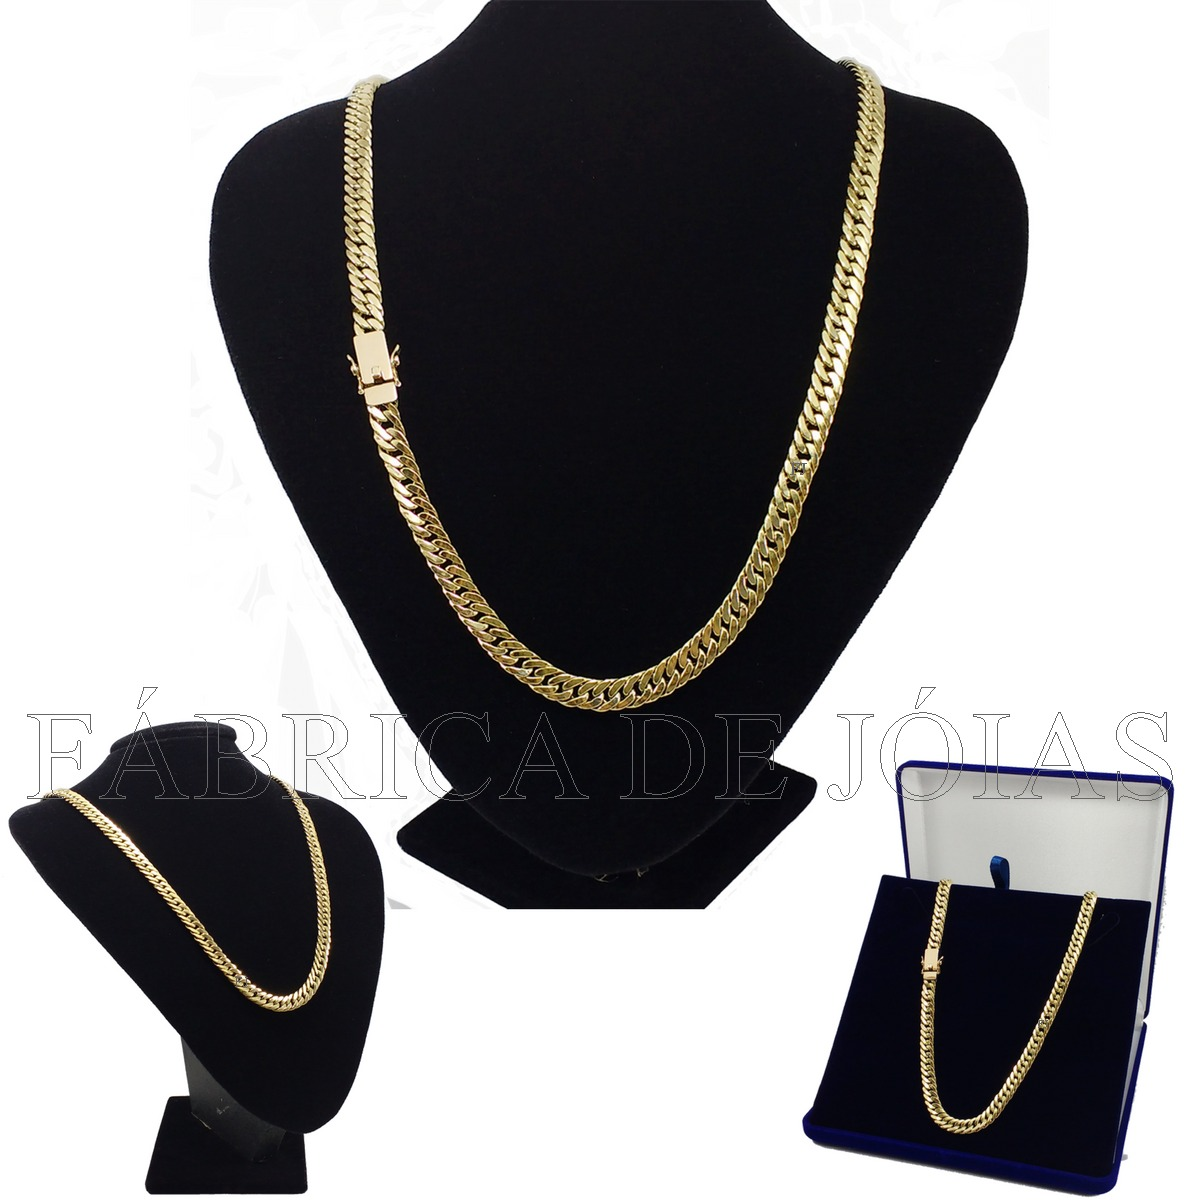 c02c336312161 cordão corrente grumet duplo 30 gramas de ouro 18k 750 oco. Carregando zoom.